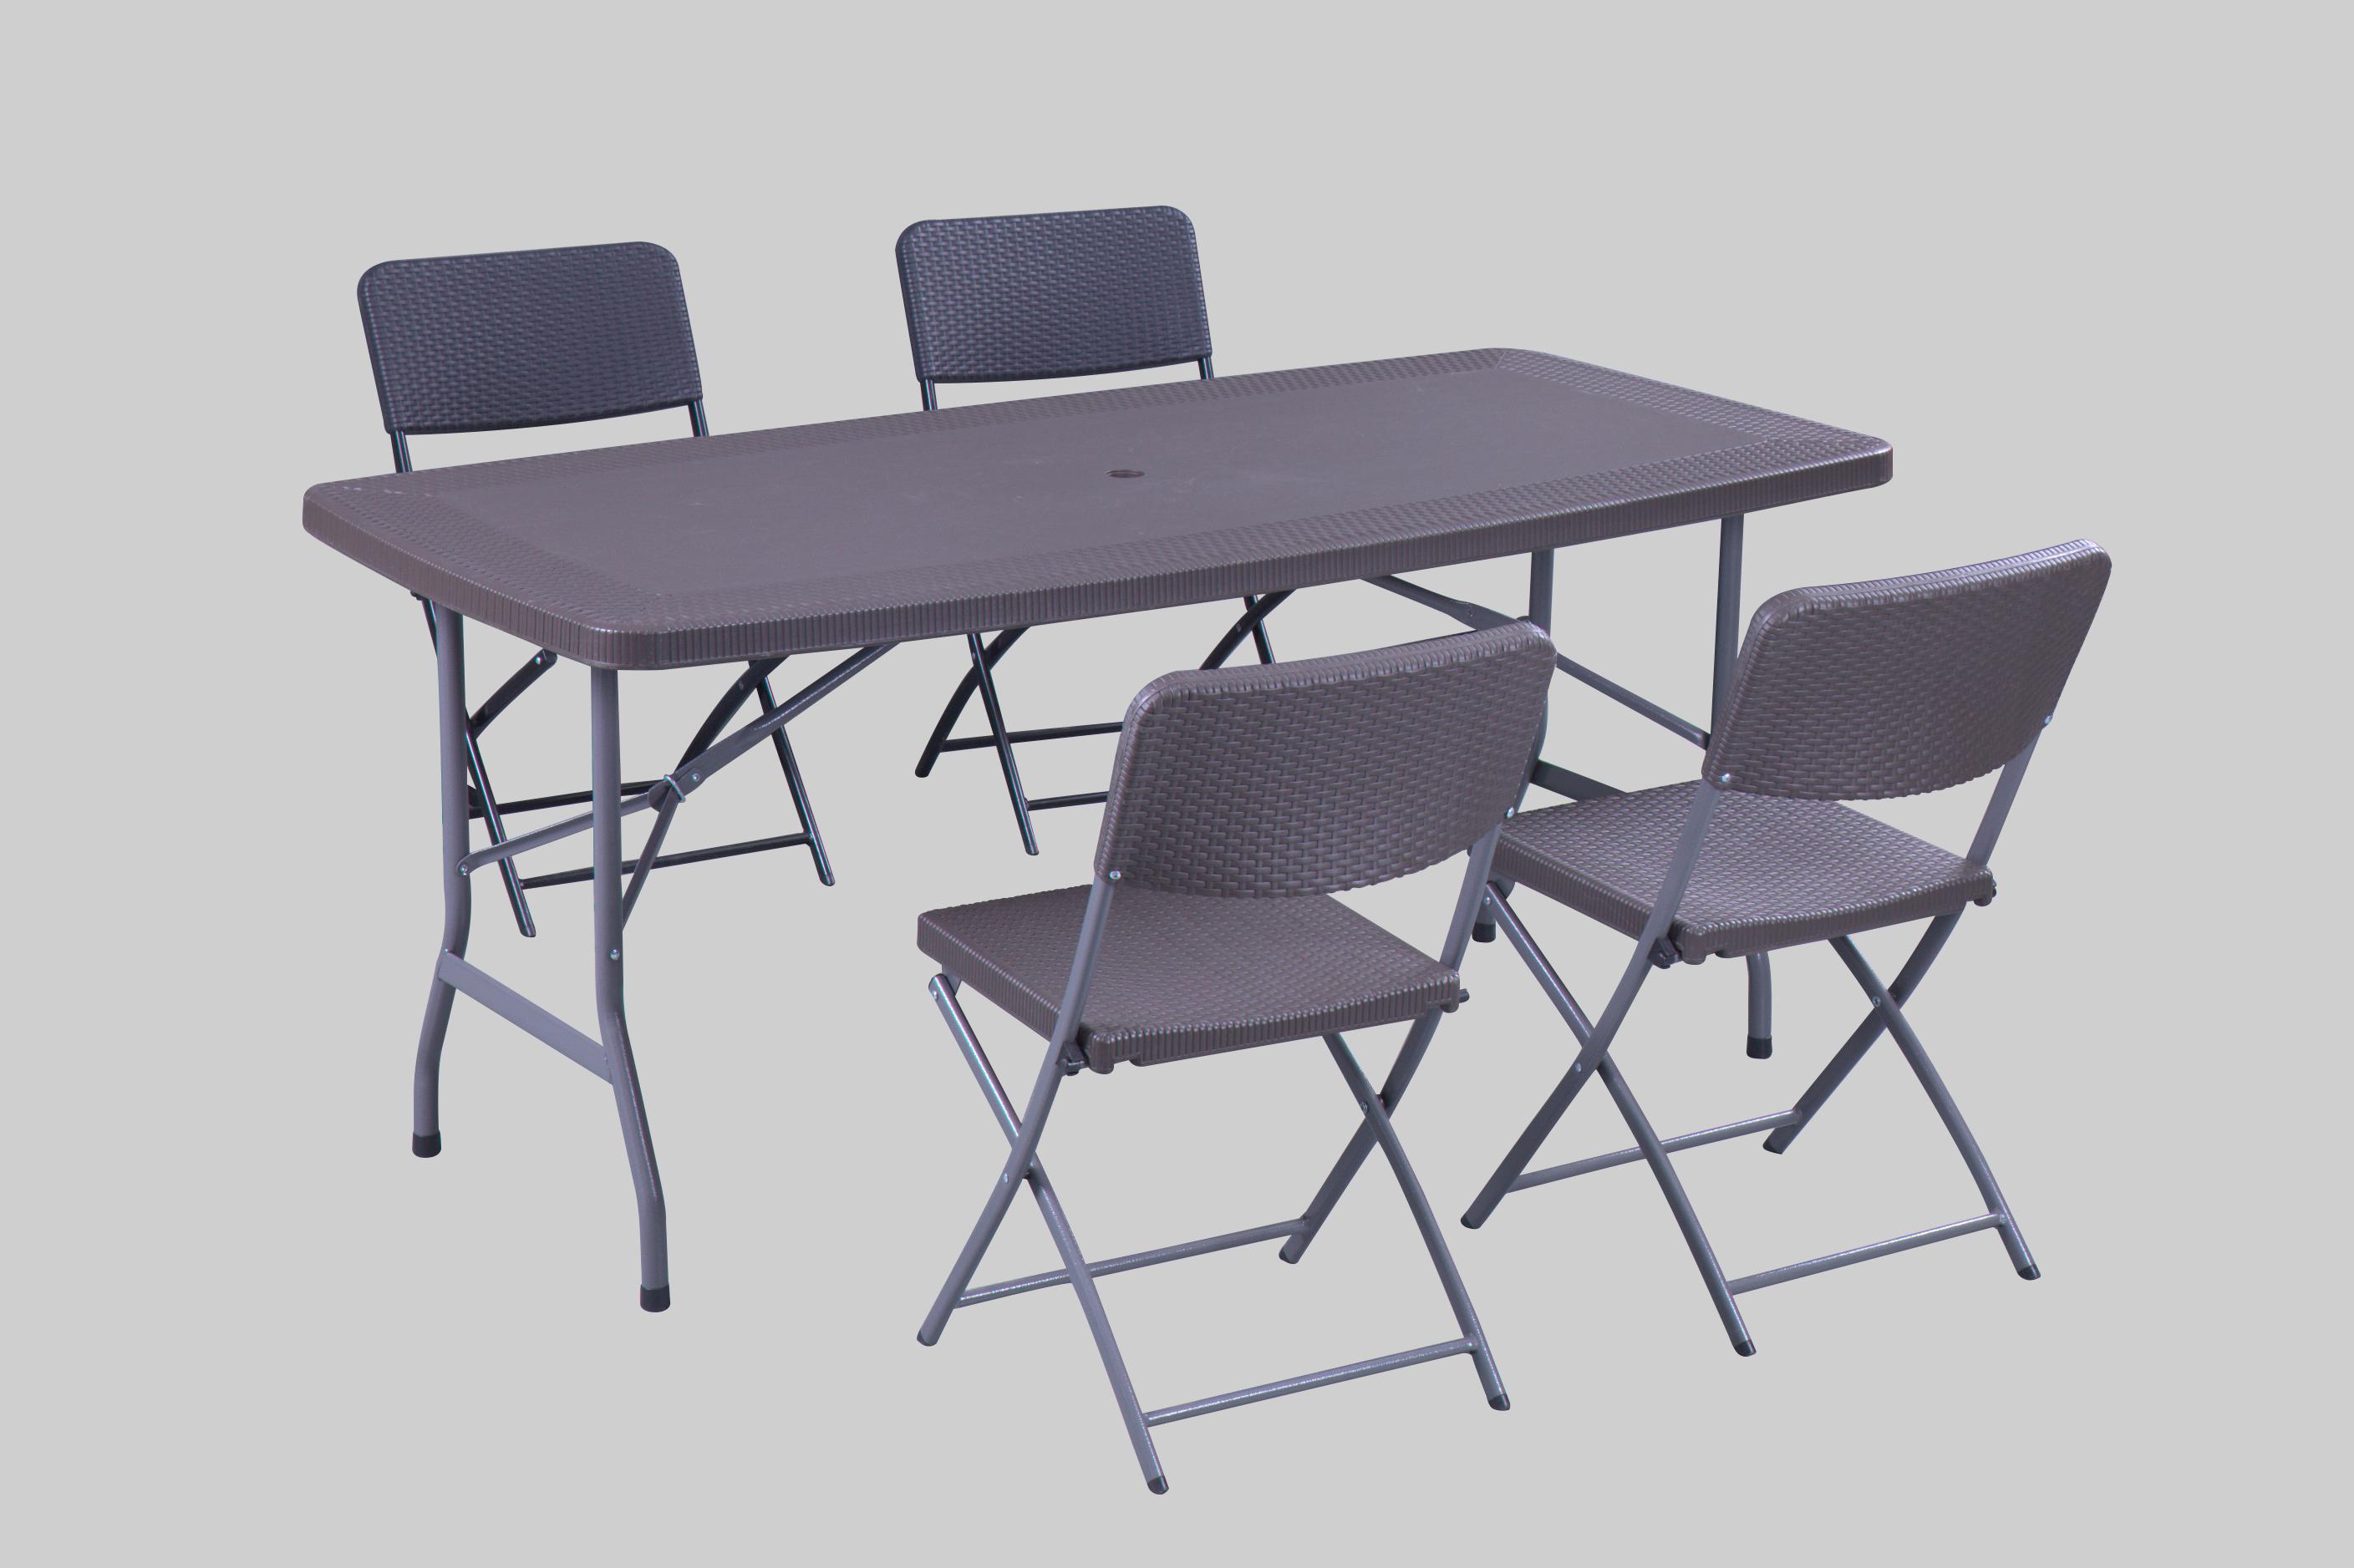 New Rattan Table USE Umbrella